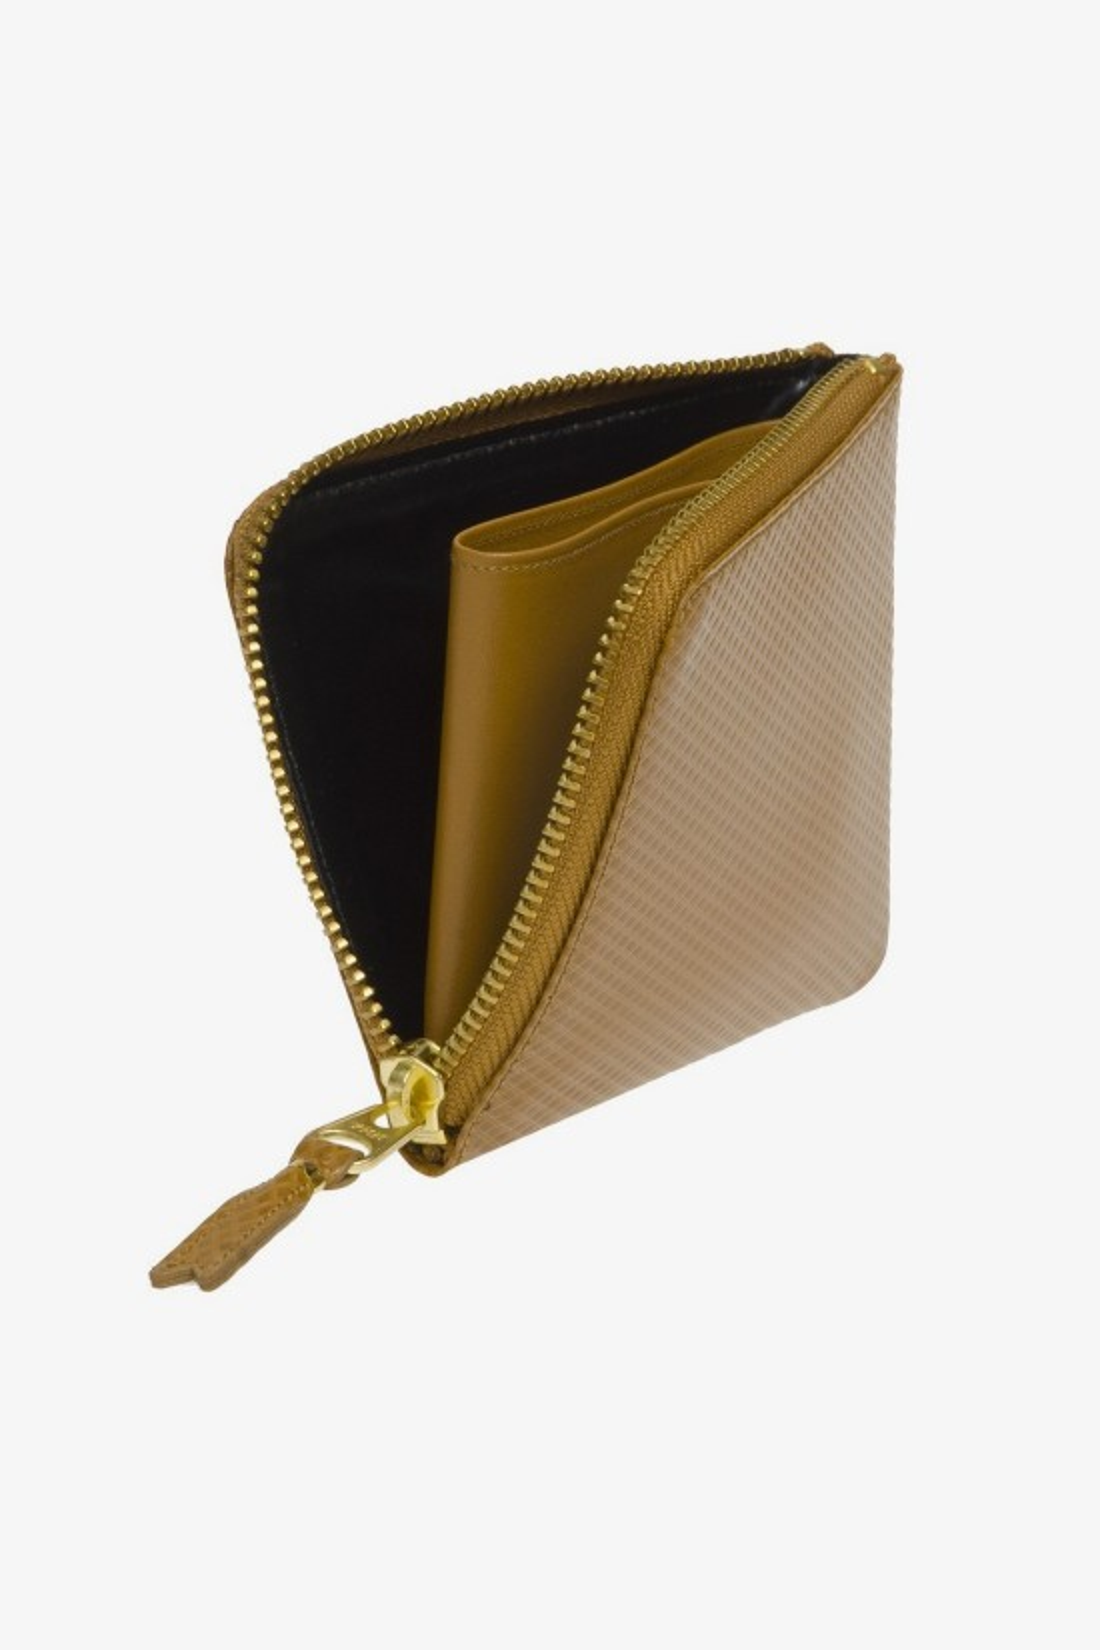 COMME DES GARÇONS WALLETS / Cdg luxury group sa3100lg Beige